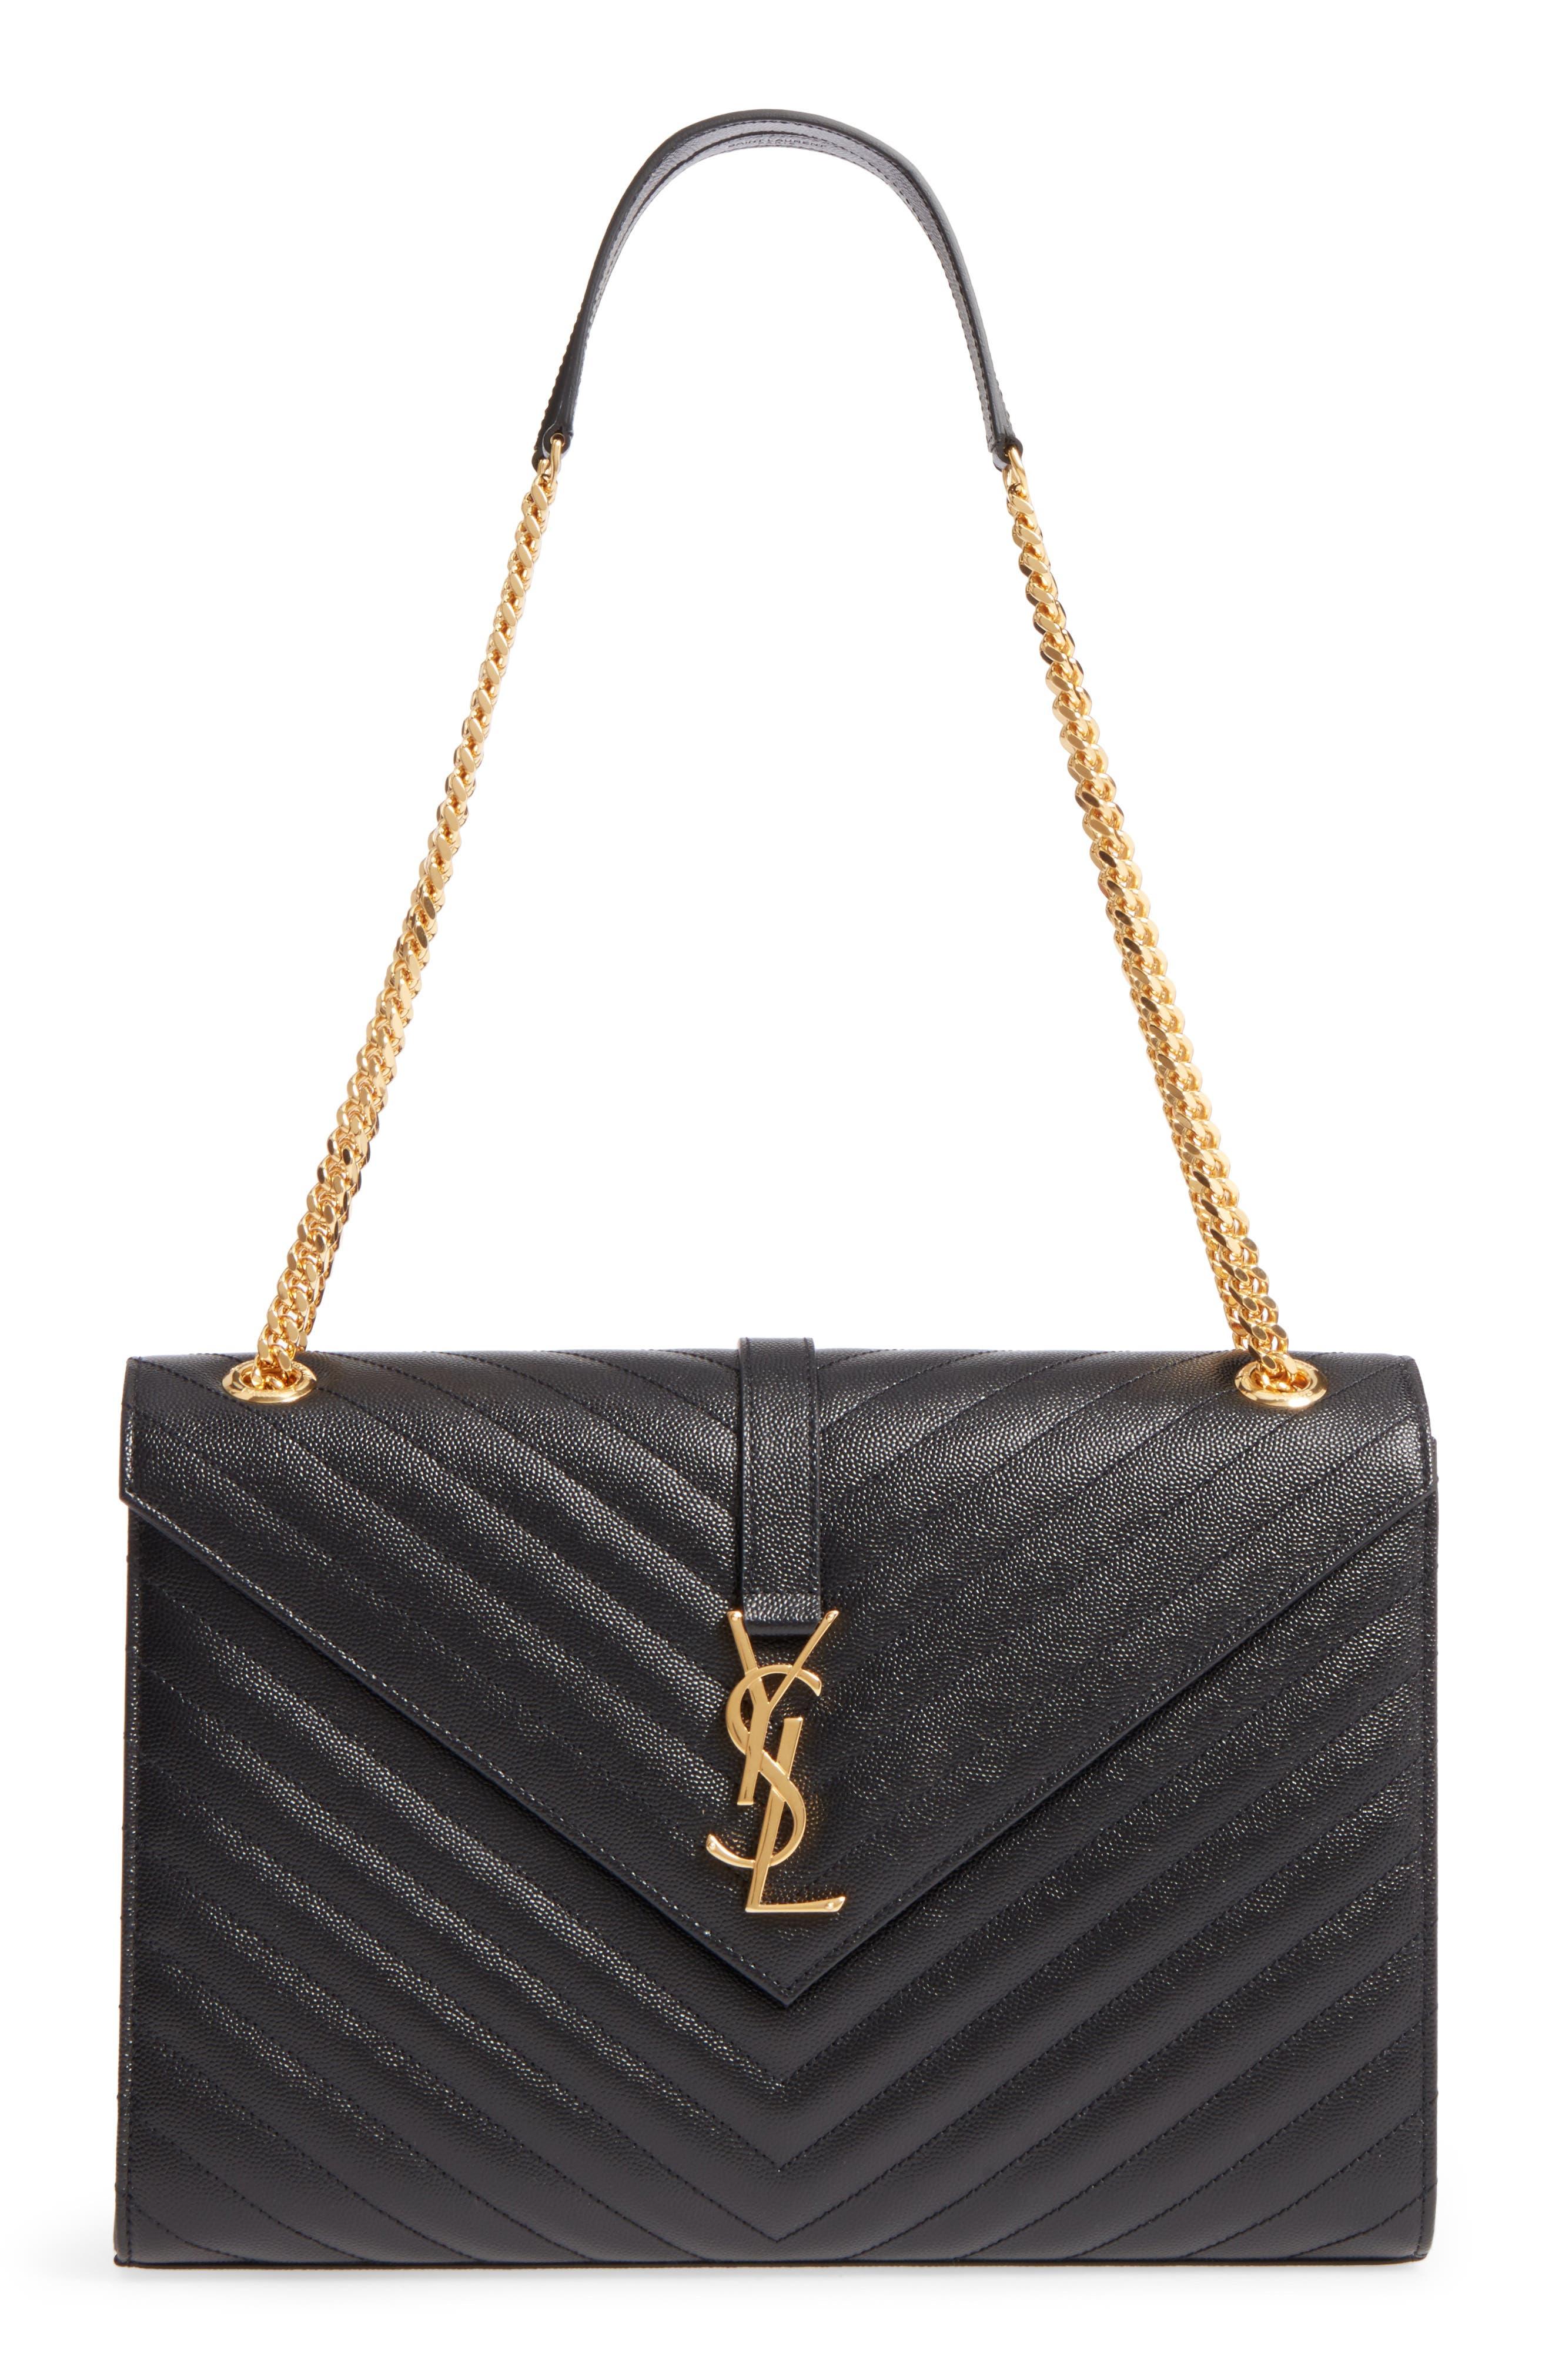 Medium Grained Matelassé Quilted Leather Shoulder Bag,                         Main,                         color, 001